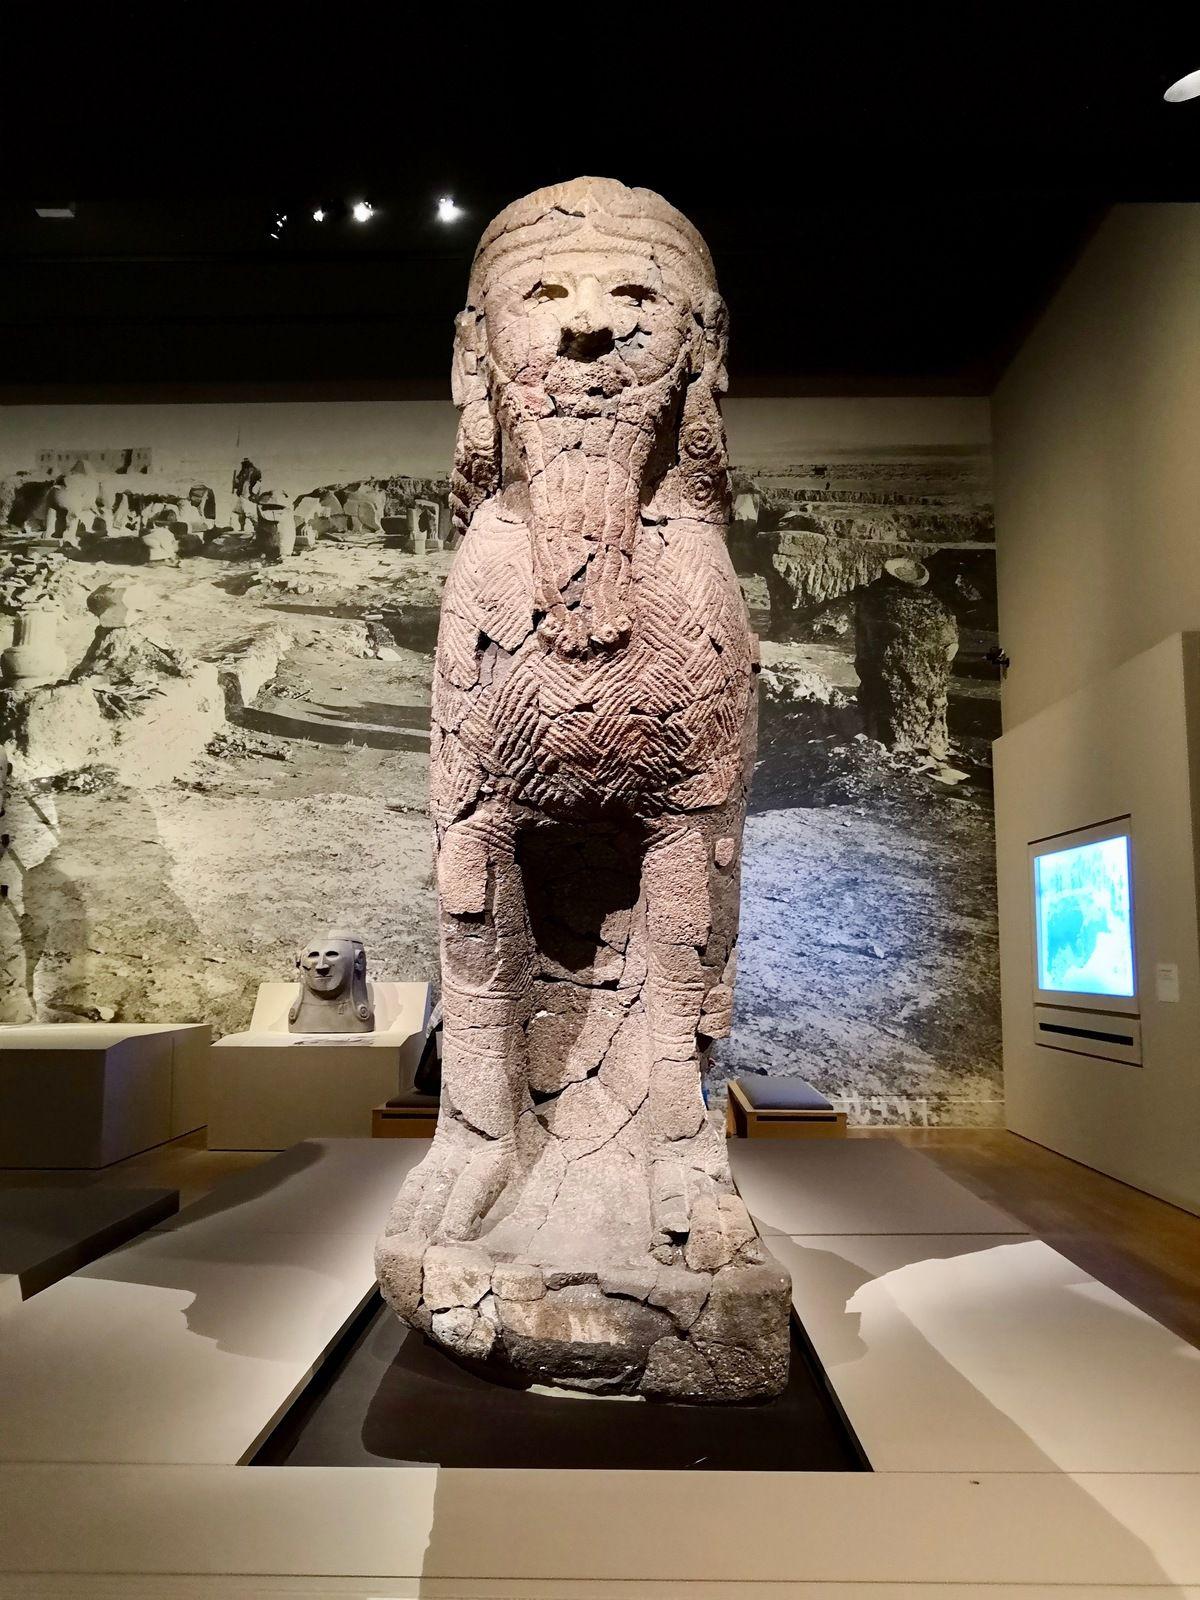 Statue d'homme oiseau-scorpion, Basalte, Tell Halaf (Syrie), ancienne Guzana, Vers 900 av. J.-C., Berlin, Pergamommuseum